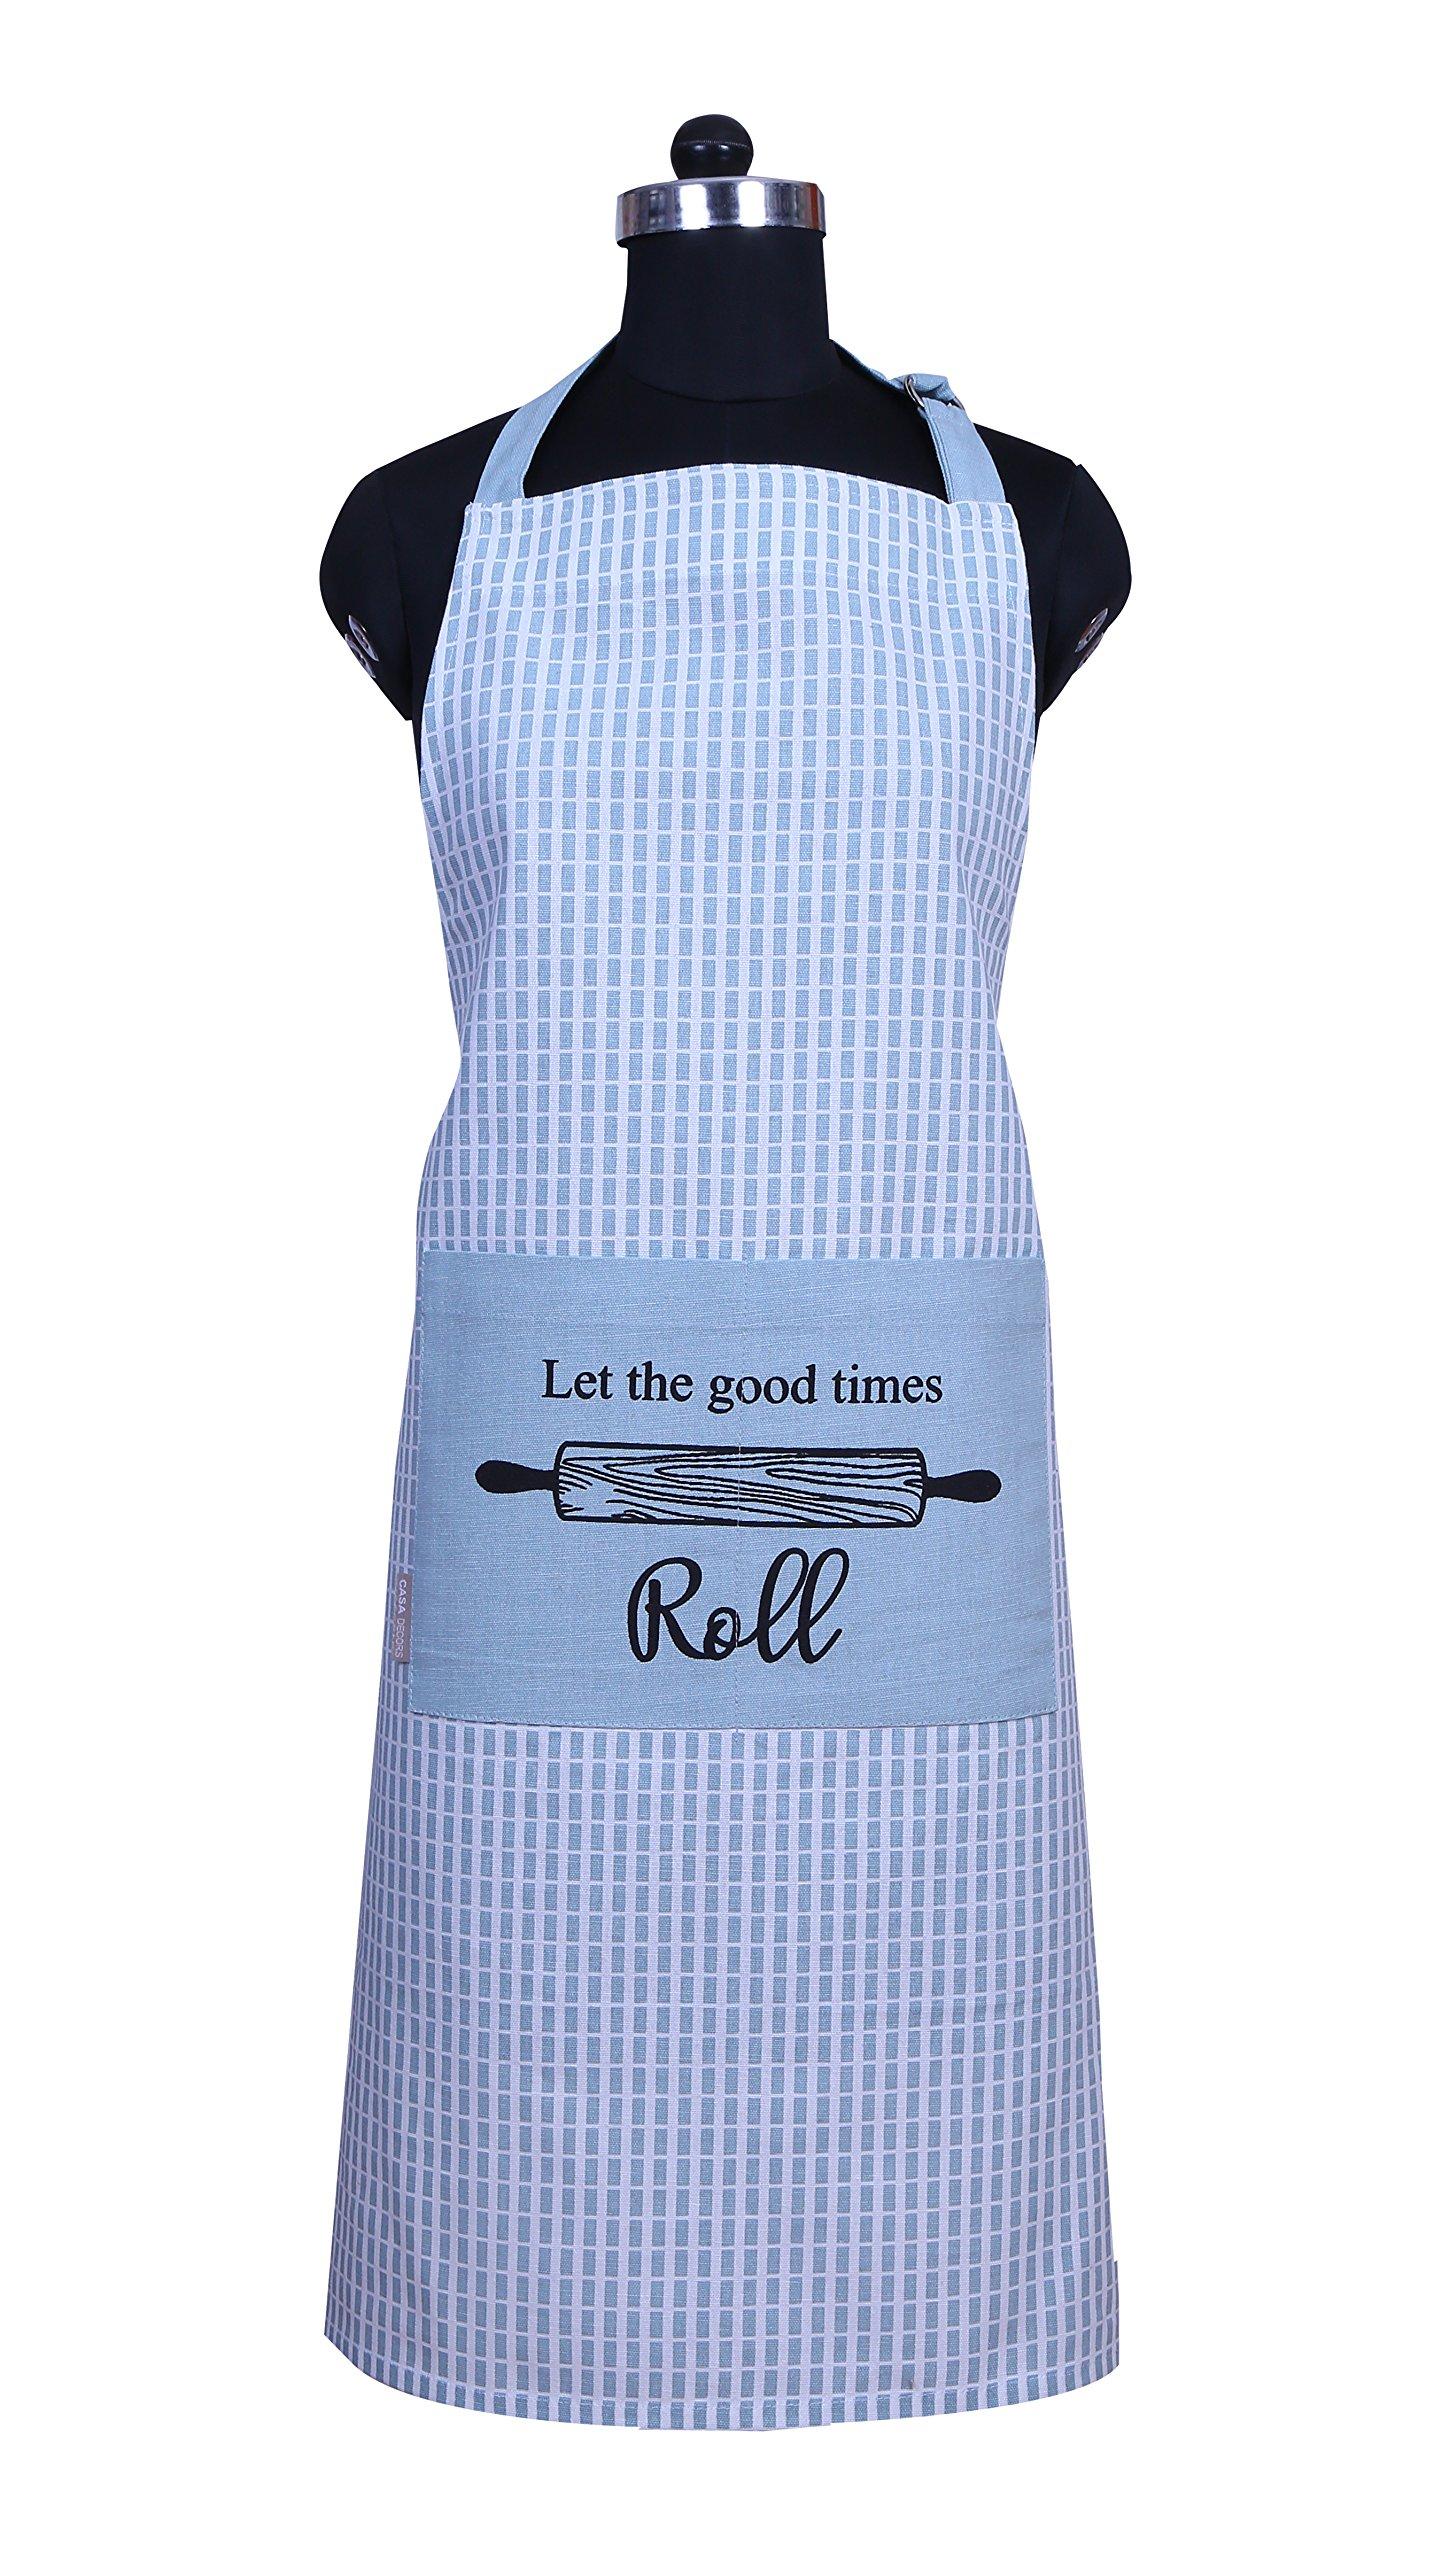 CASA DECORS Apron, Baking Fun Design, Aprons Women Pockets, 100% Natural Cotton, Eco-Friendly & Safe, Adjustable Neck & Waist ties